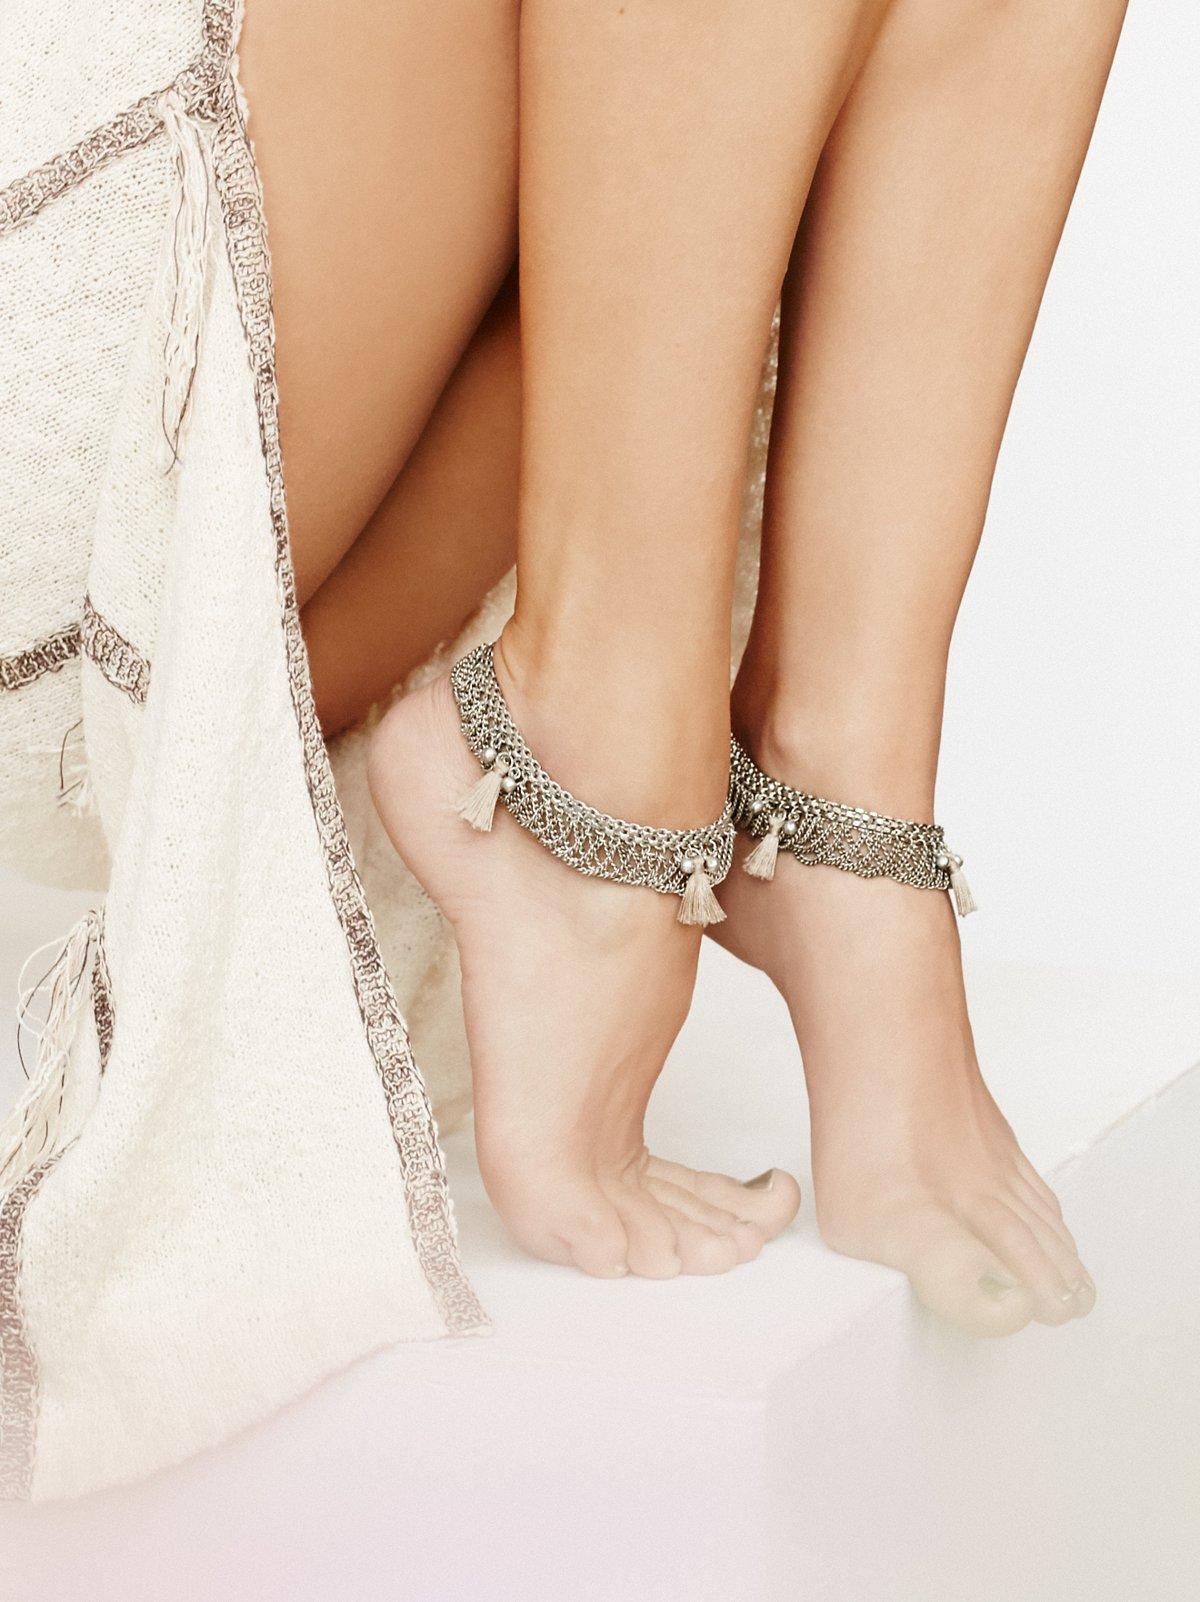 Anklets & Ankle Bracelets